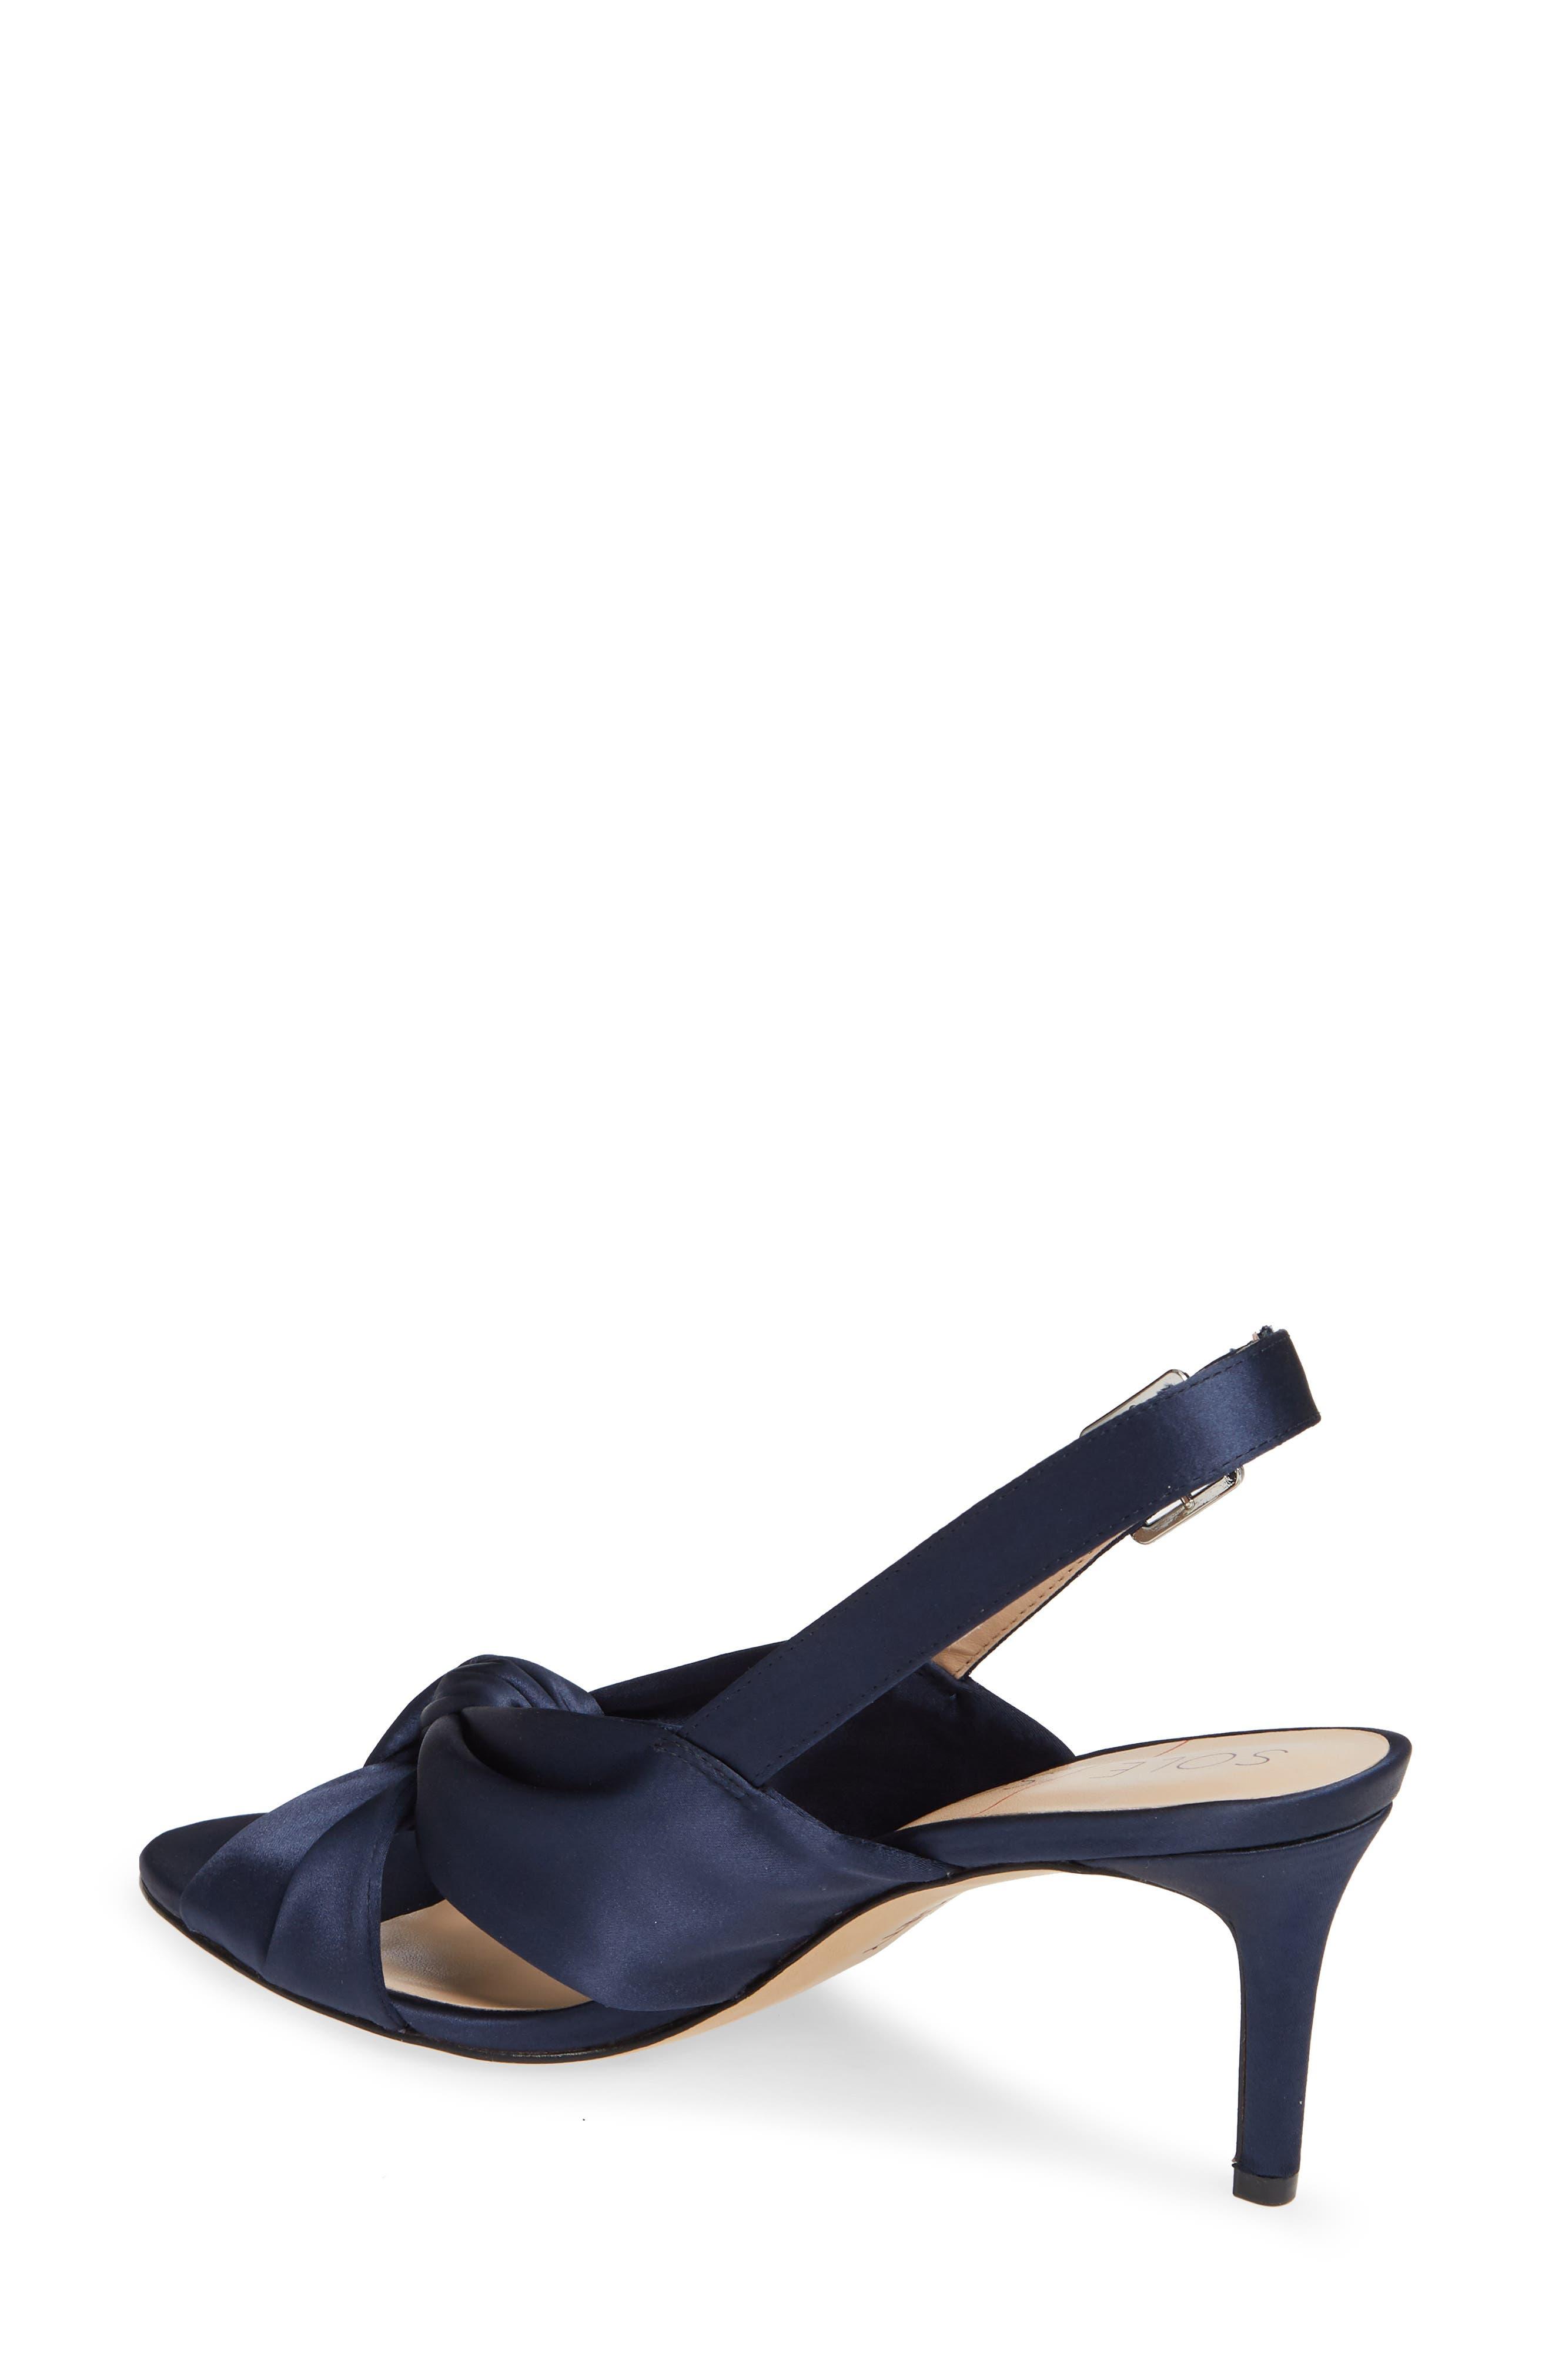 Genneene Knotted Slingback Sandal,                             Alternate thumbnail 2, color,                             MIDNIGHT SATIN